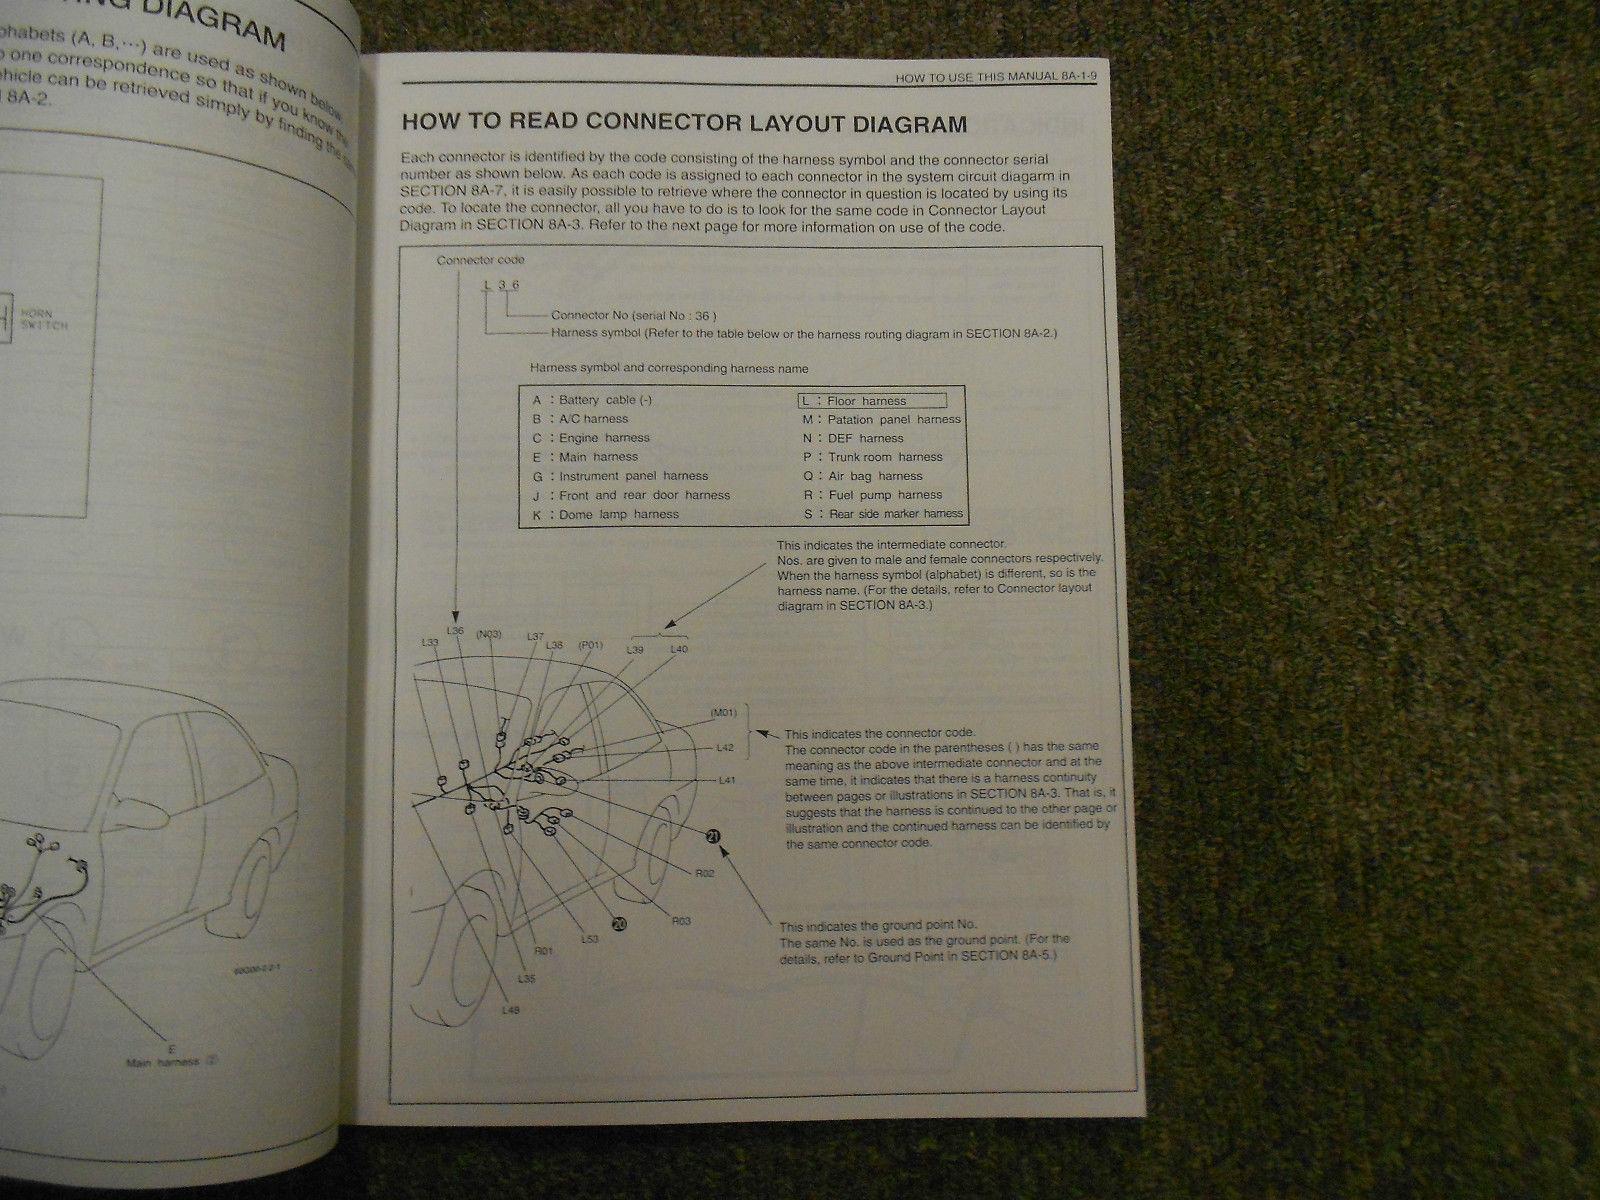 ... 1995 Suzuki Esteem Wiring Diagram Shop Manual FACTORY OEM BOOK 95 2ND  ED U.S VOL ...